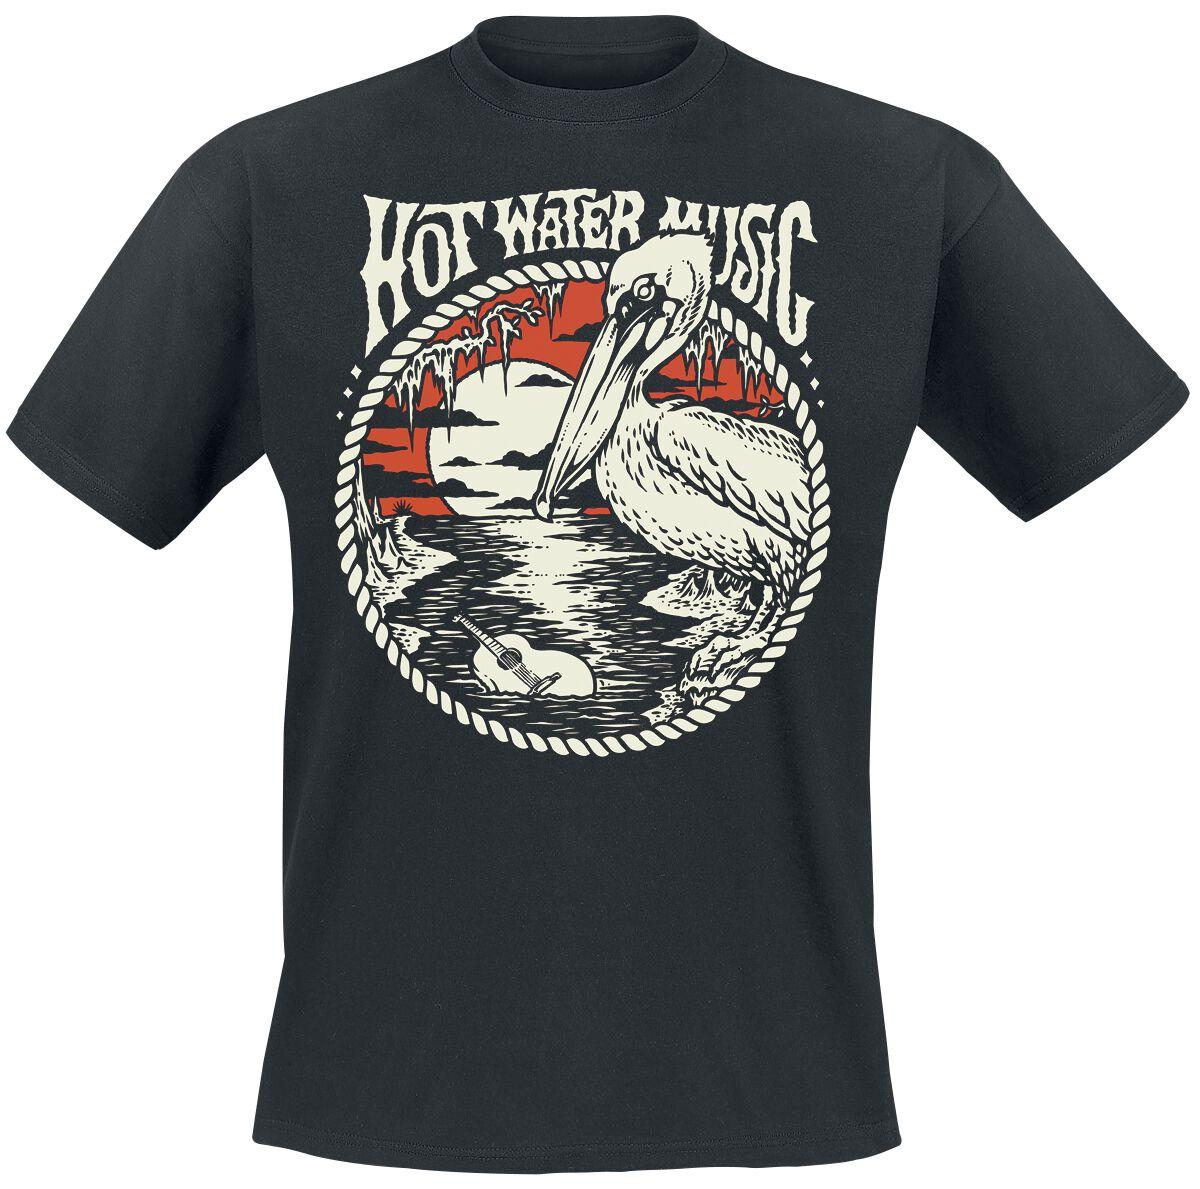 Zespoły - Koszulki - T-Shirt Hot Water Music Pelican T-Shirt czarny - 371343